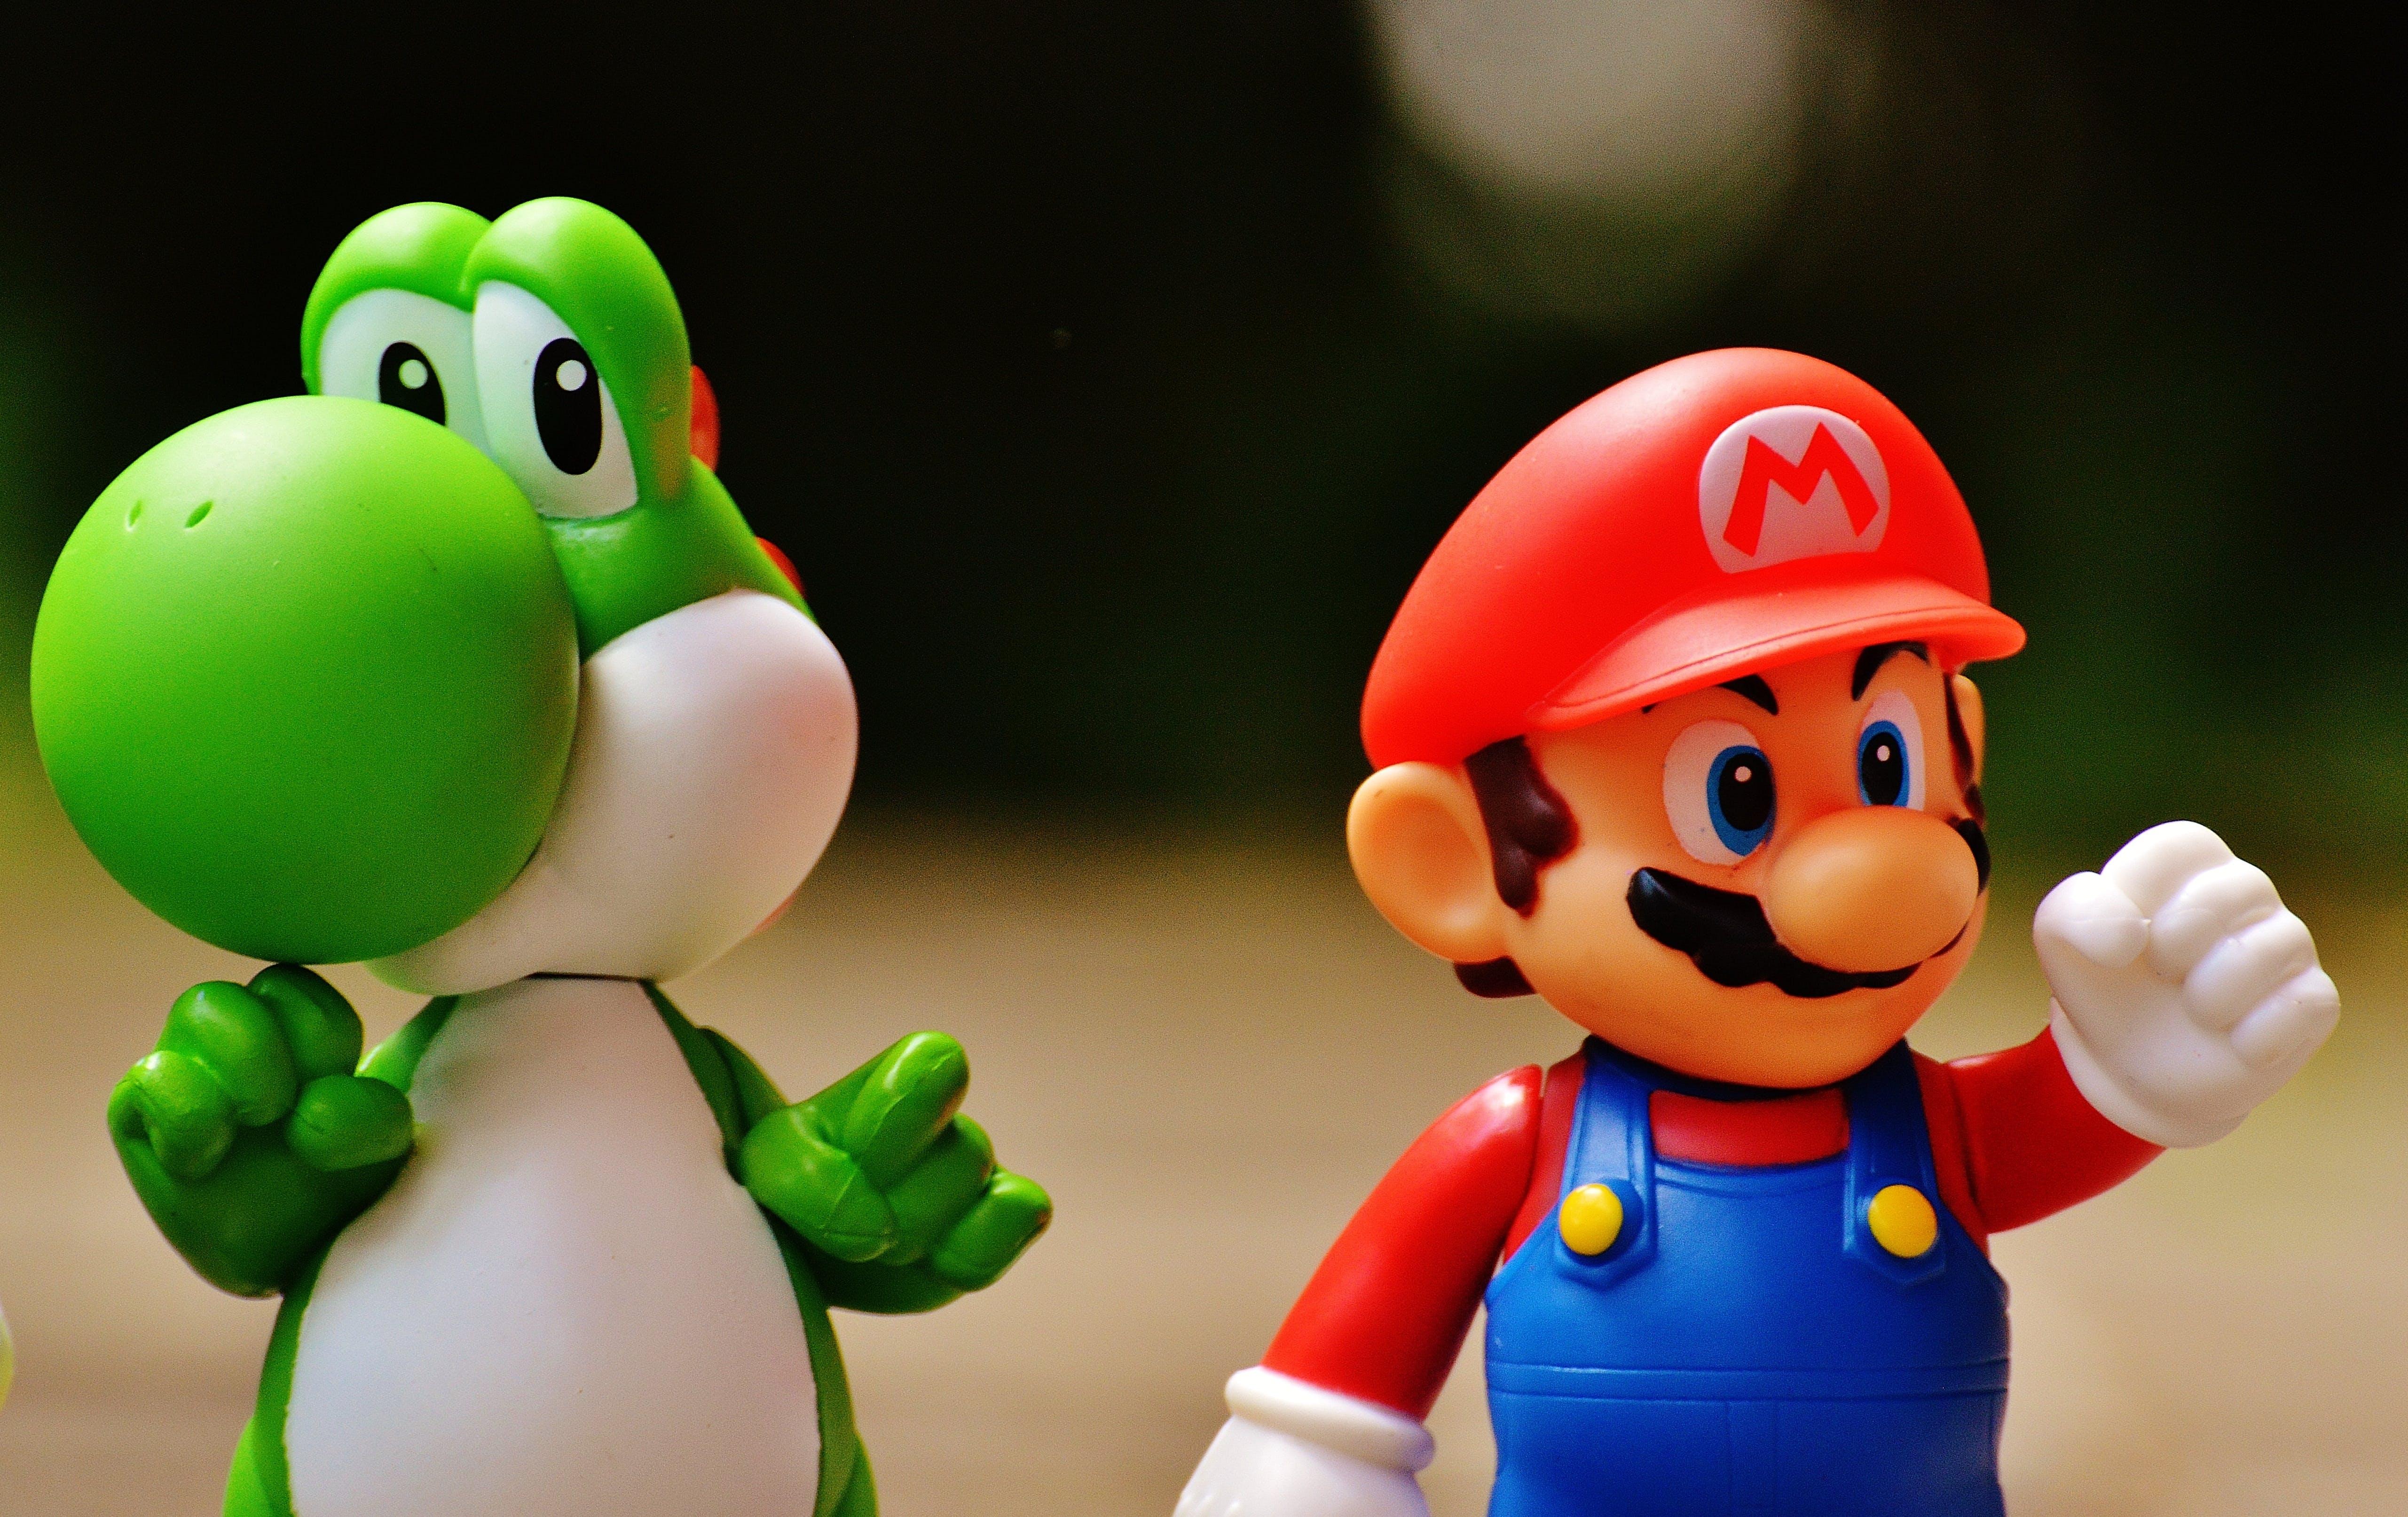 Super Mario and Yoshi Plastic Figure